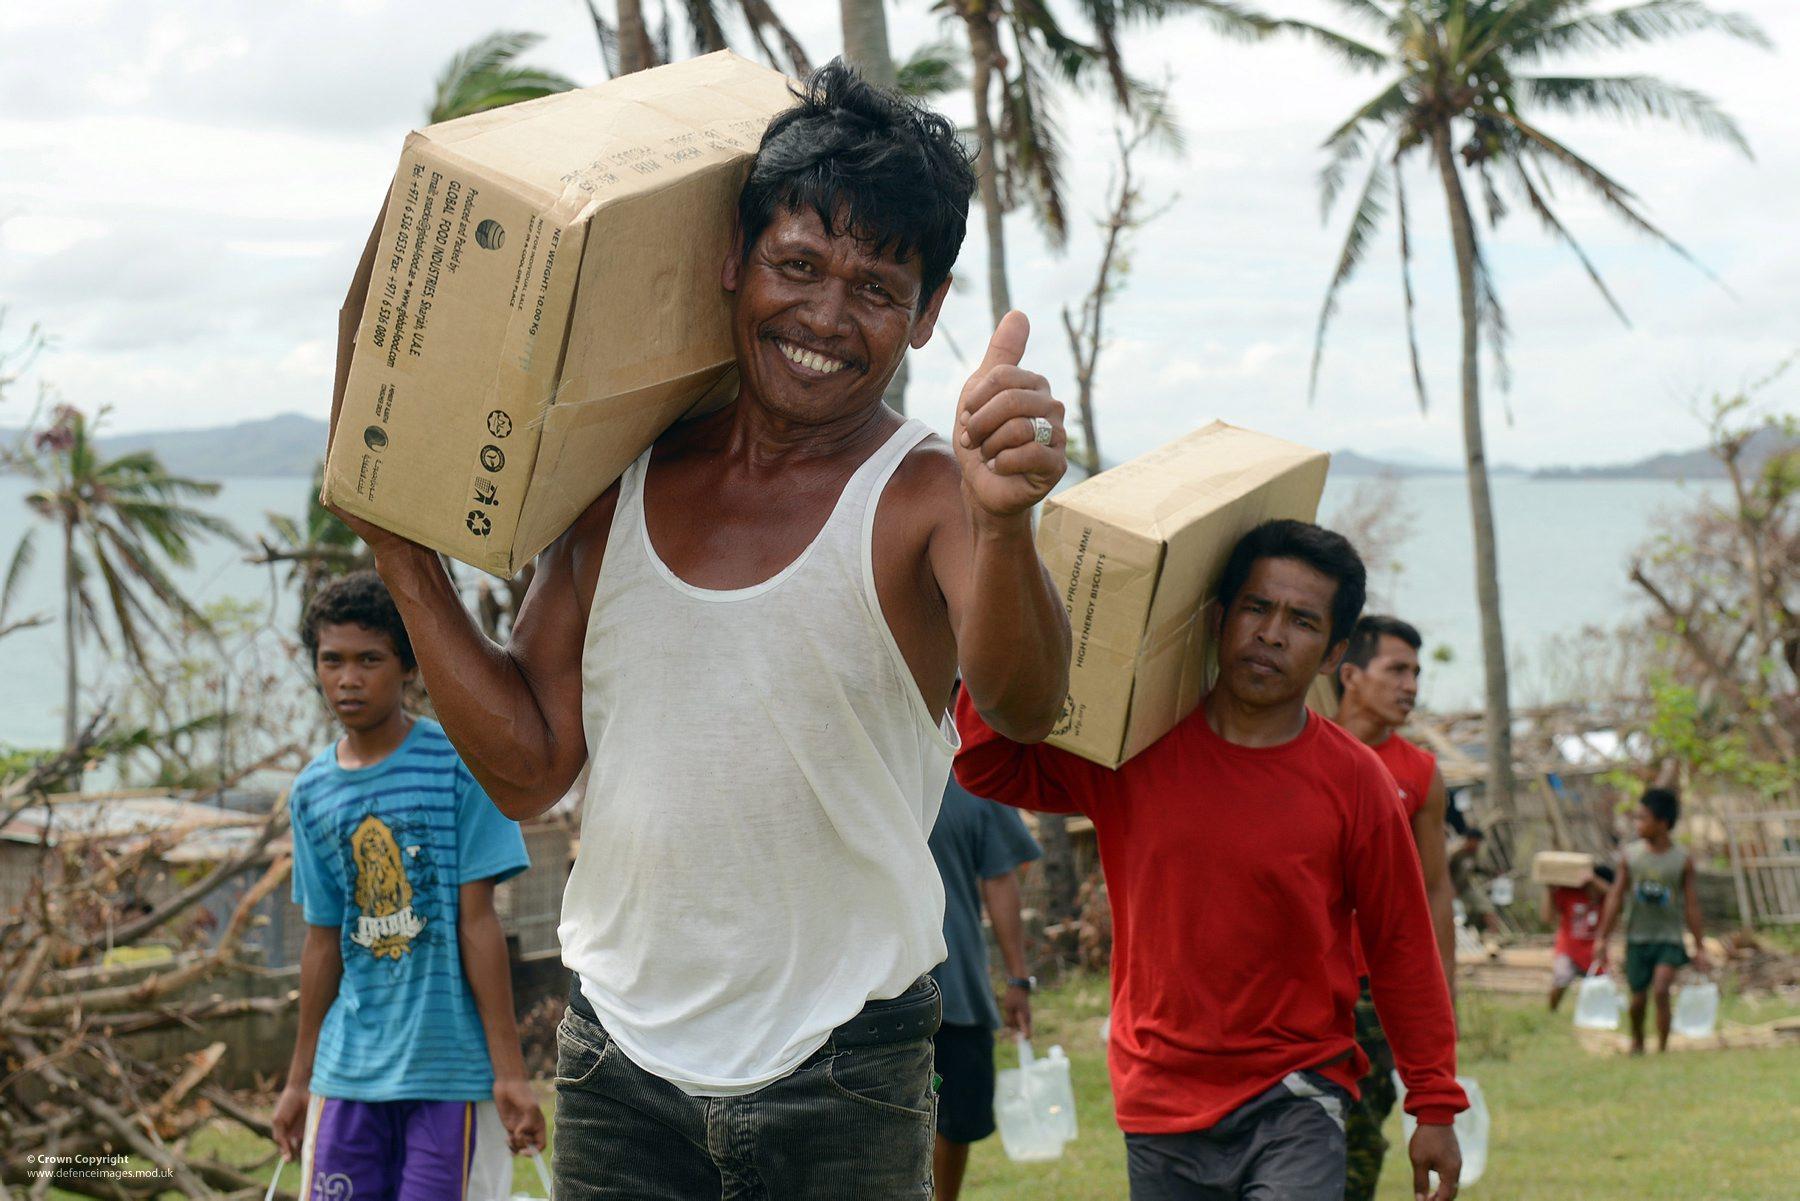 Hulp Filipijnen na tyfoon Haiyan. Beeld: Flickr.cc,